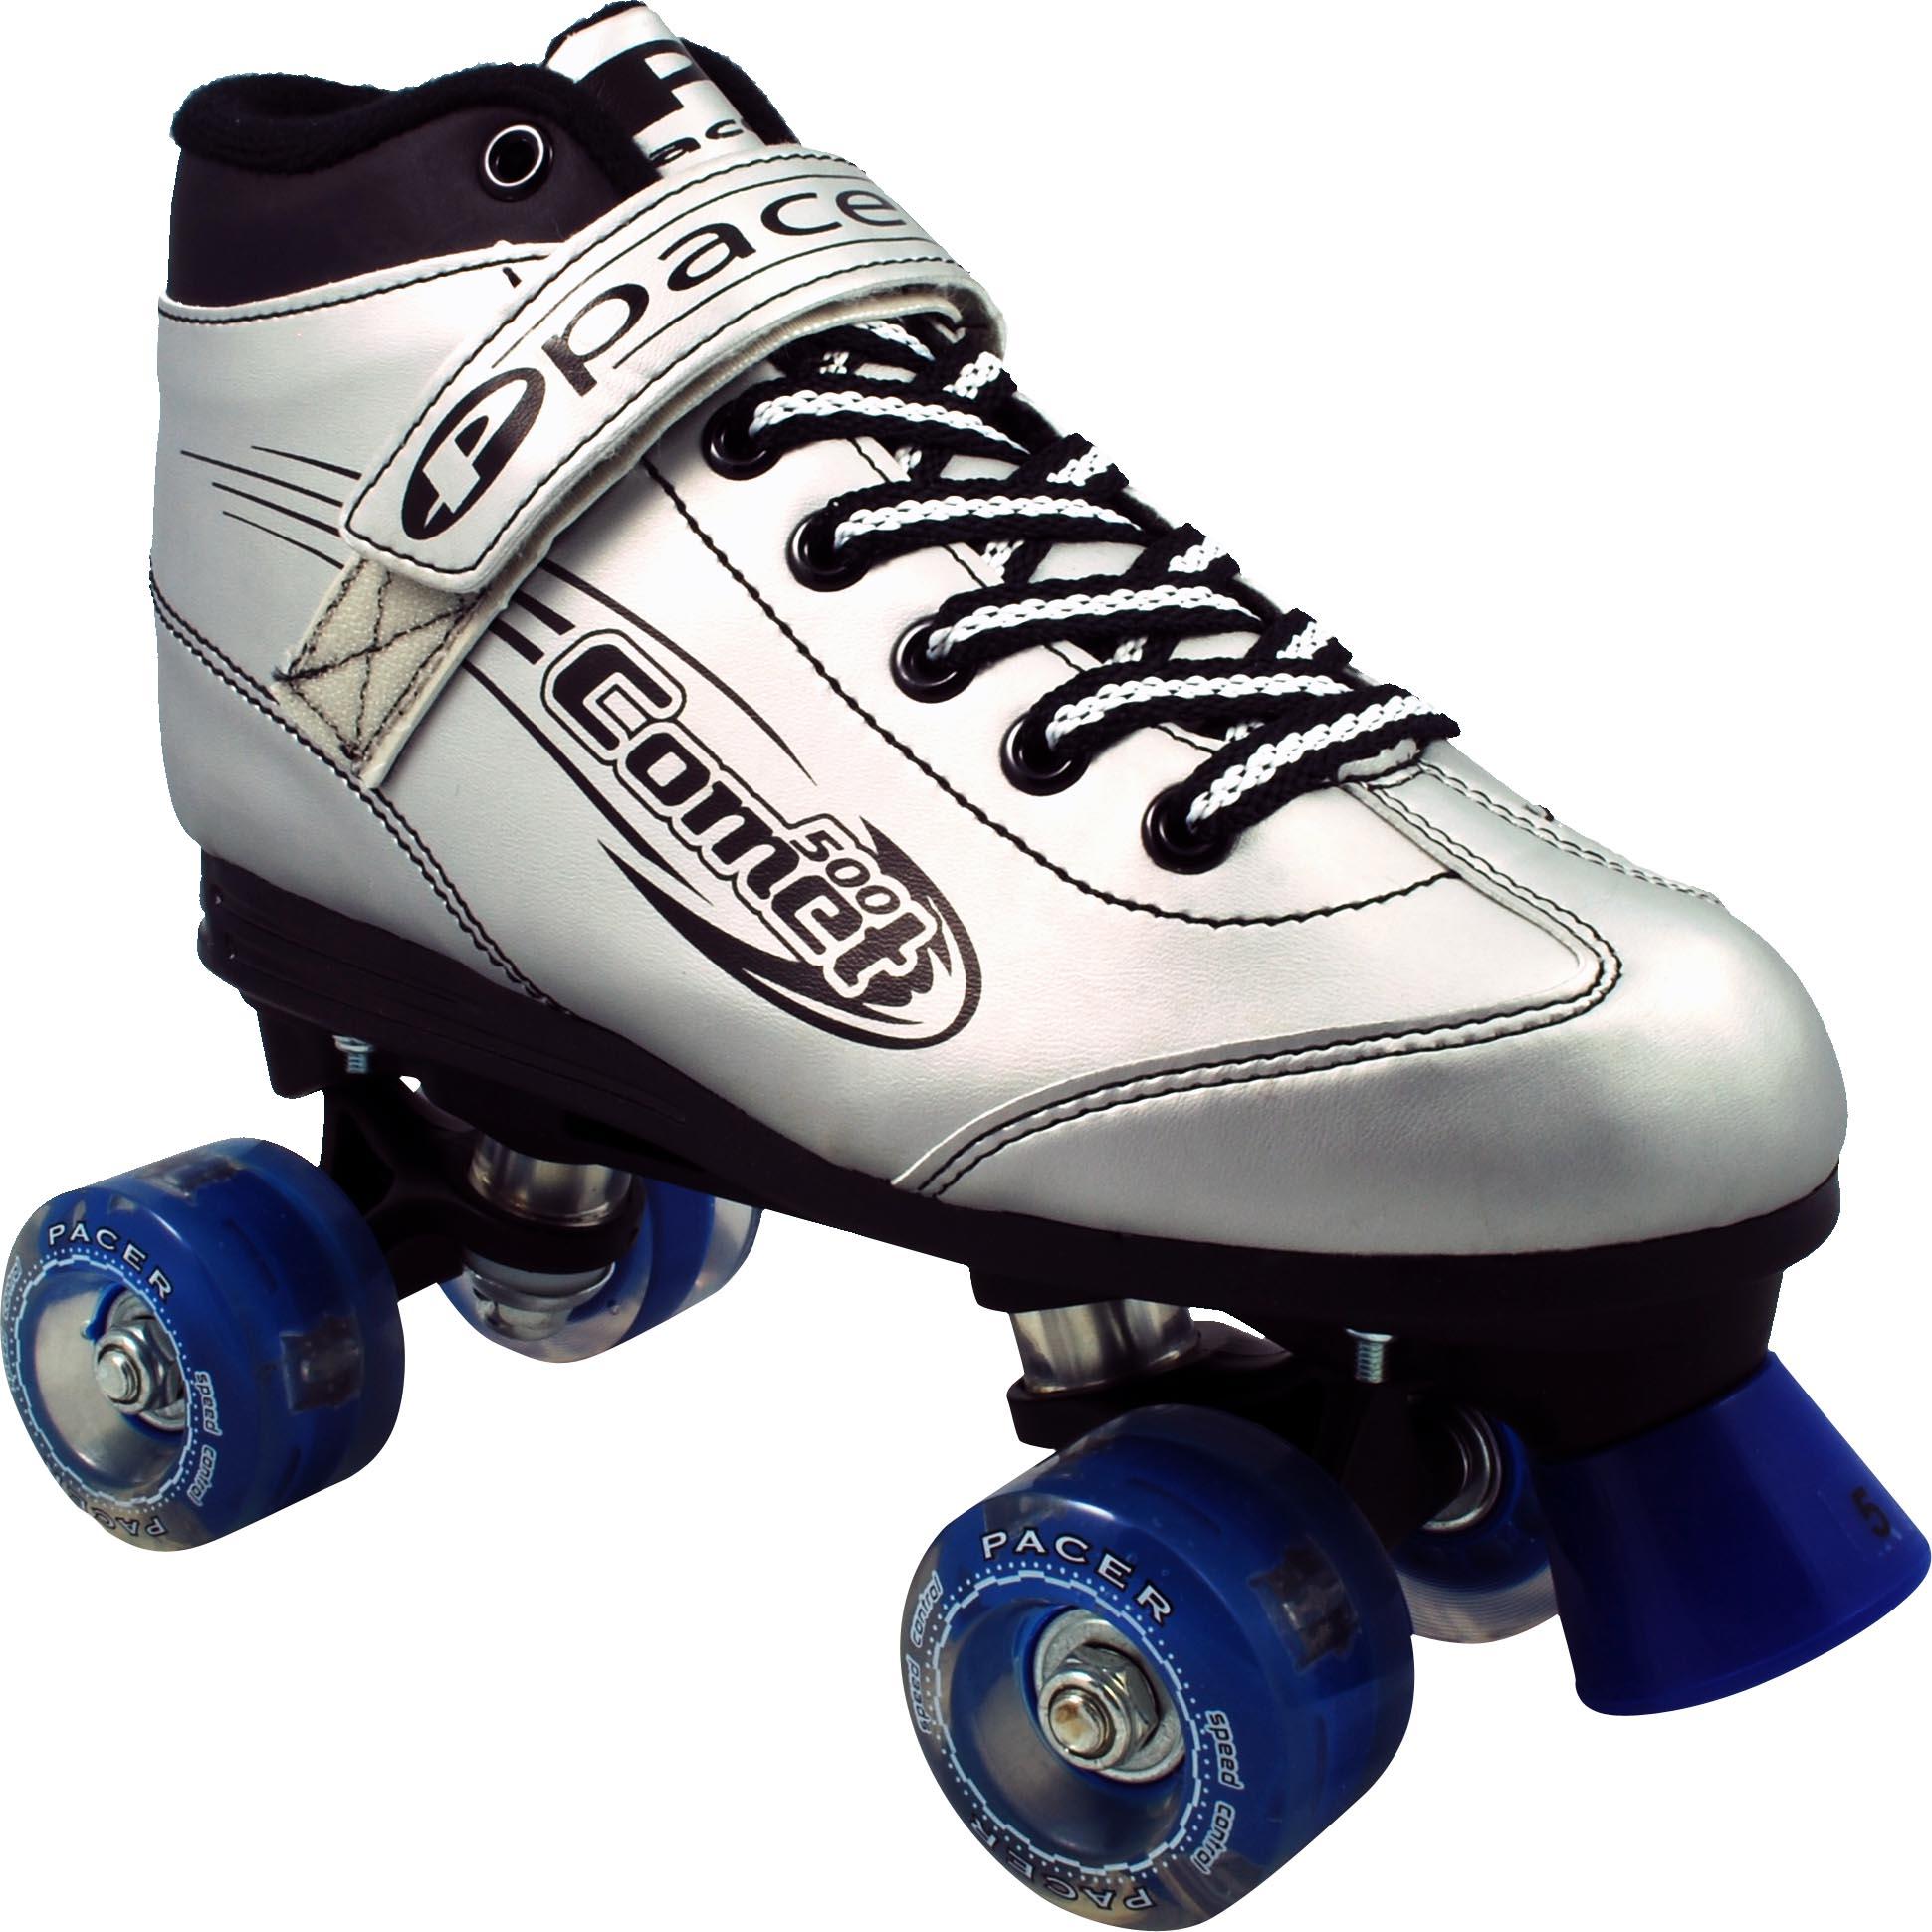 INSTOCK Pacer Silver Comet Light-Up Skates! Last ones in Junior 12!